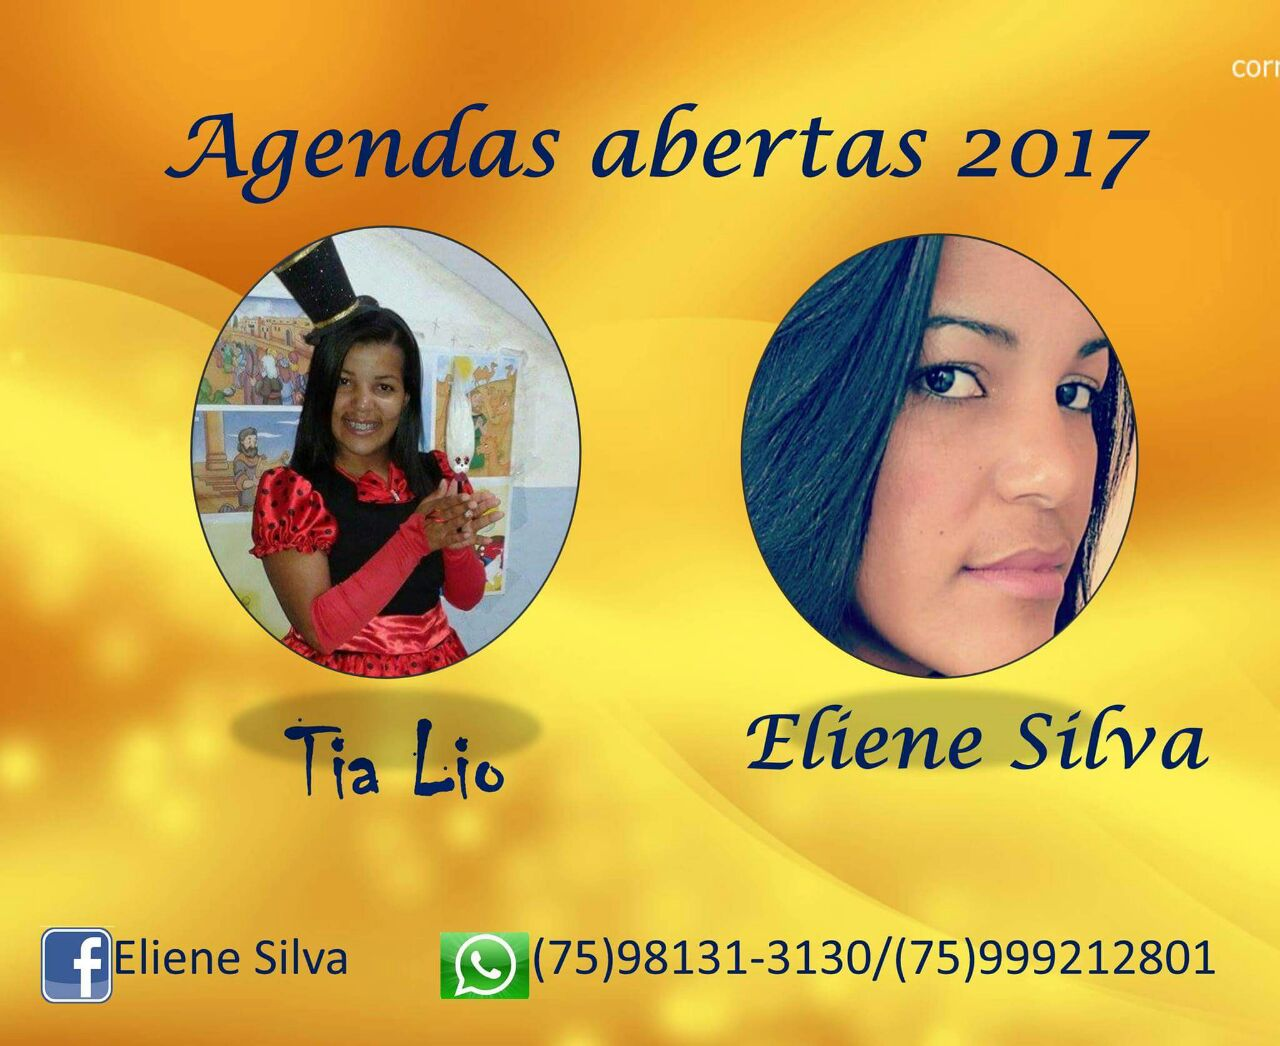 Tia Lio e Ministério Eliene Silva